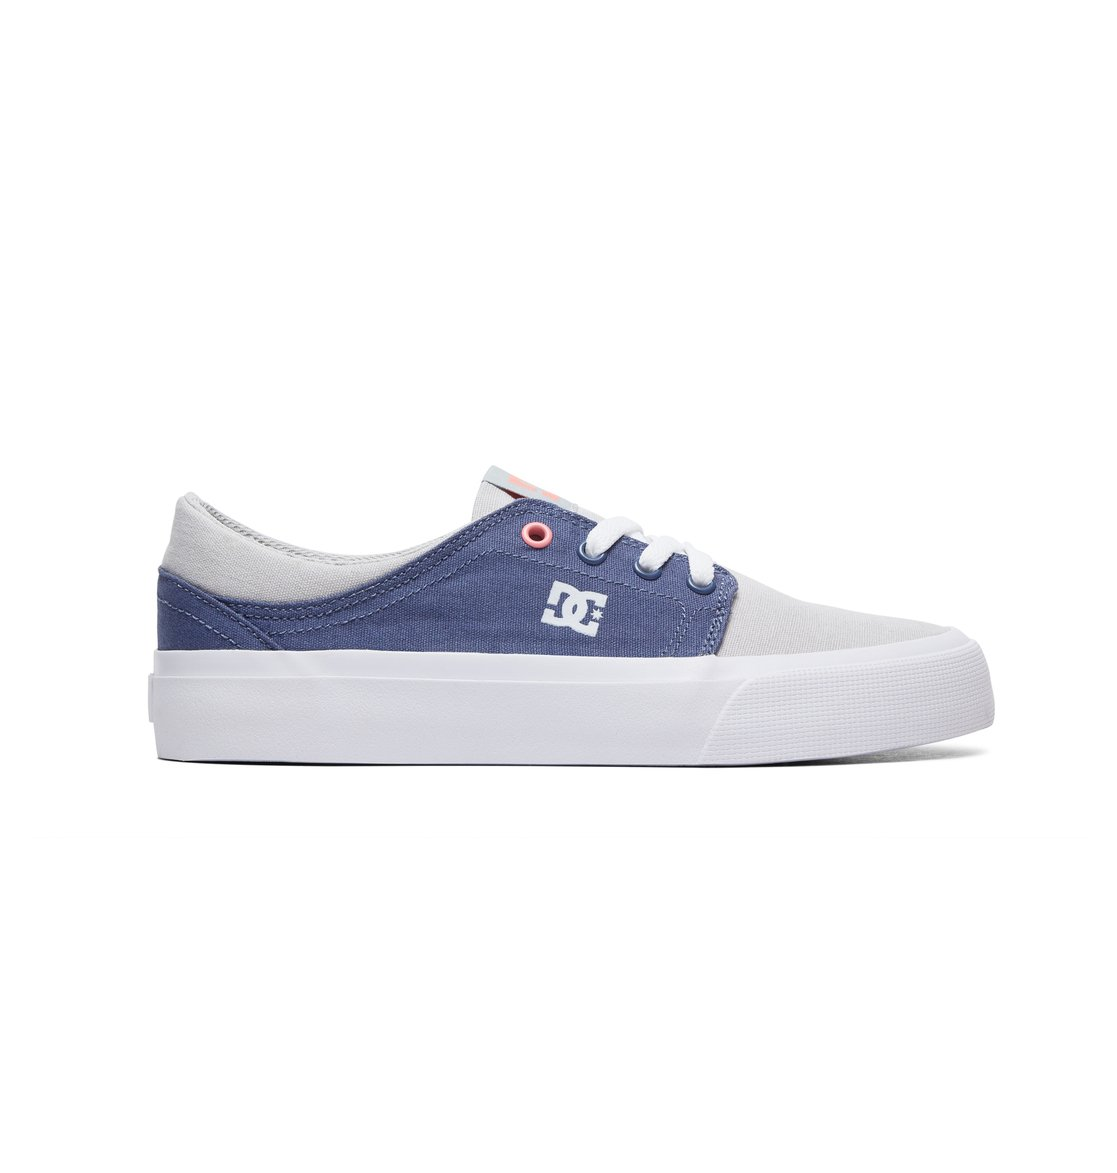 5b75a65cad7dd 0 Trase TX - Zapatillas para Mujer Azul ADJS300078 DC Shoes